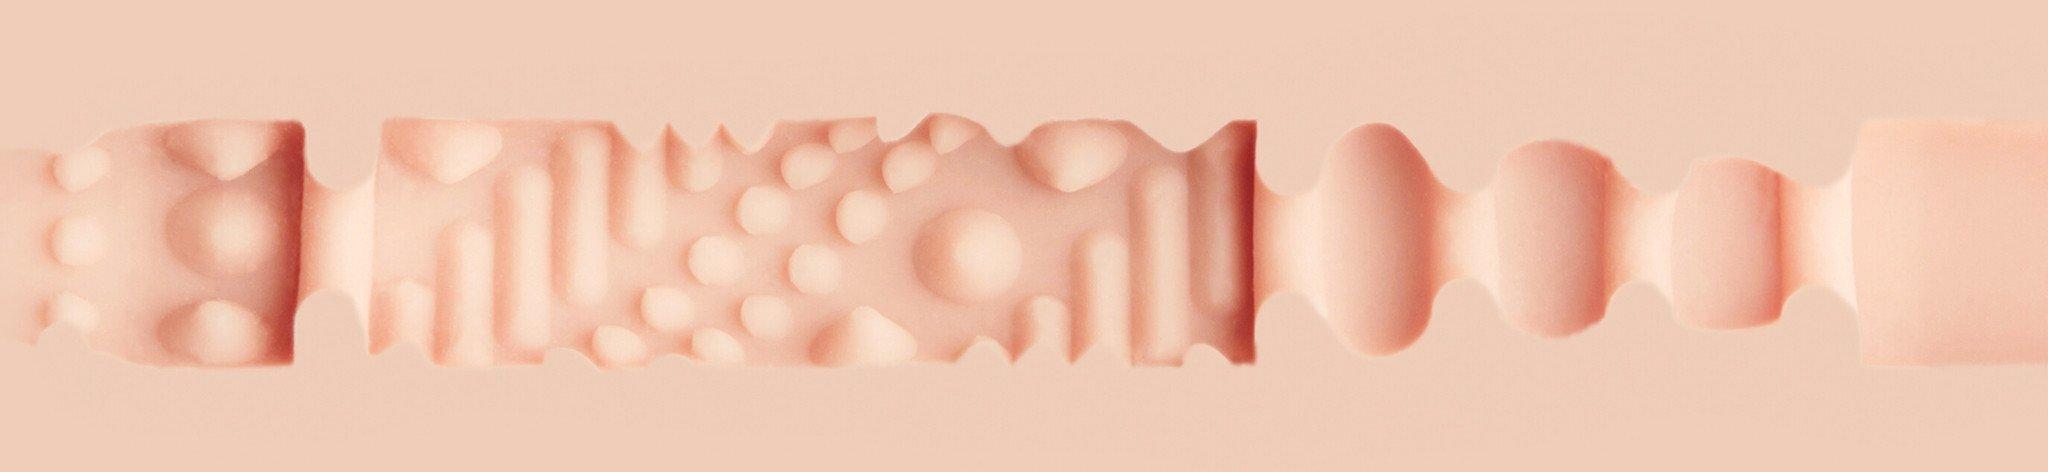 Attack-Revel Texture Image